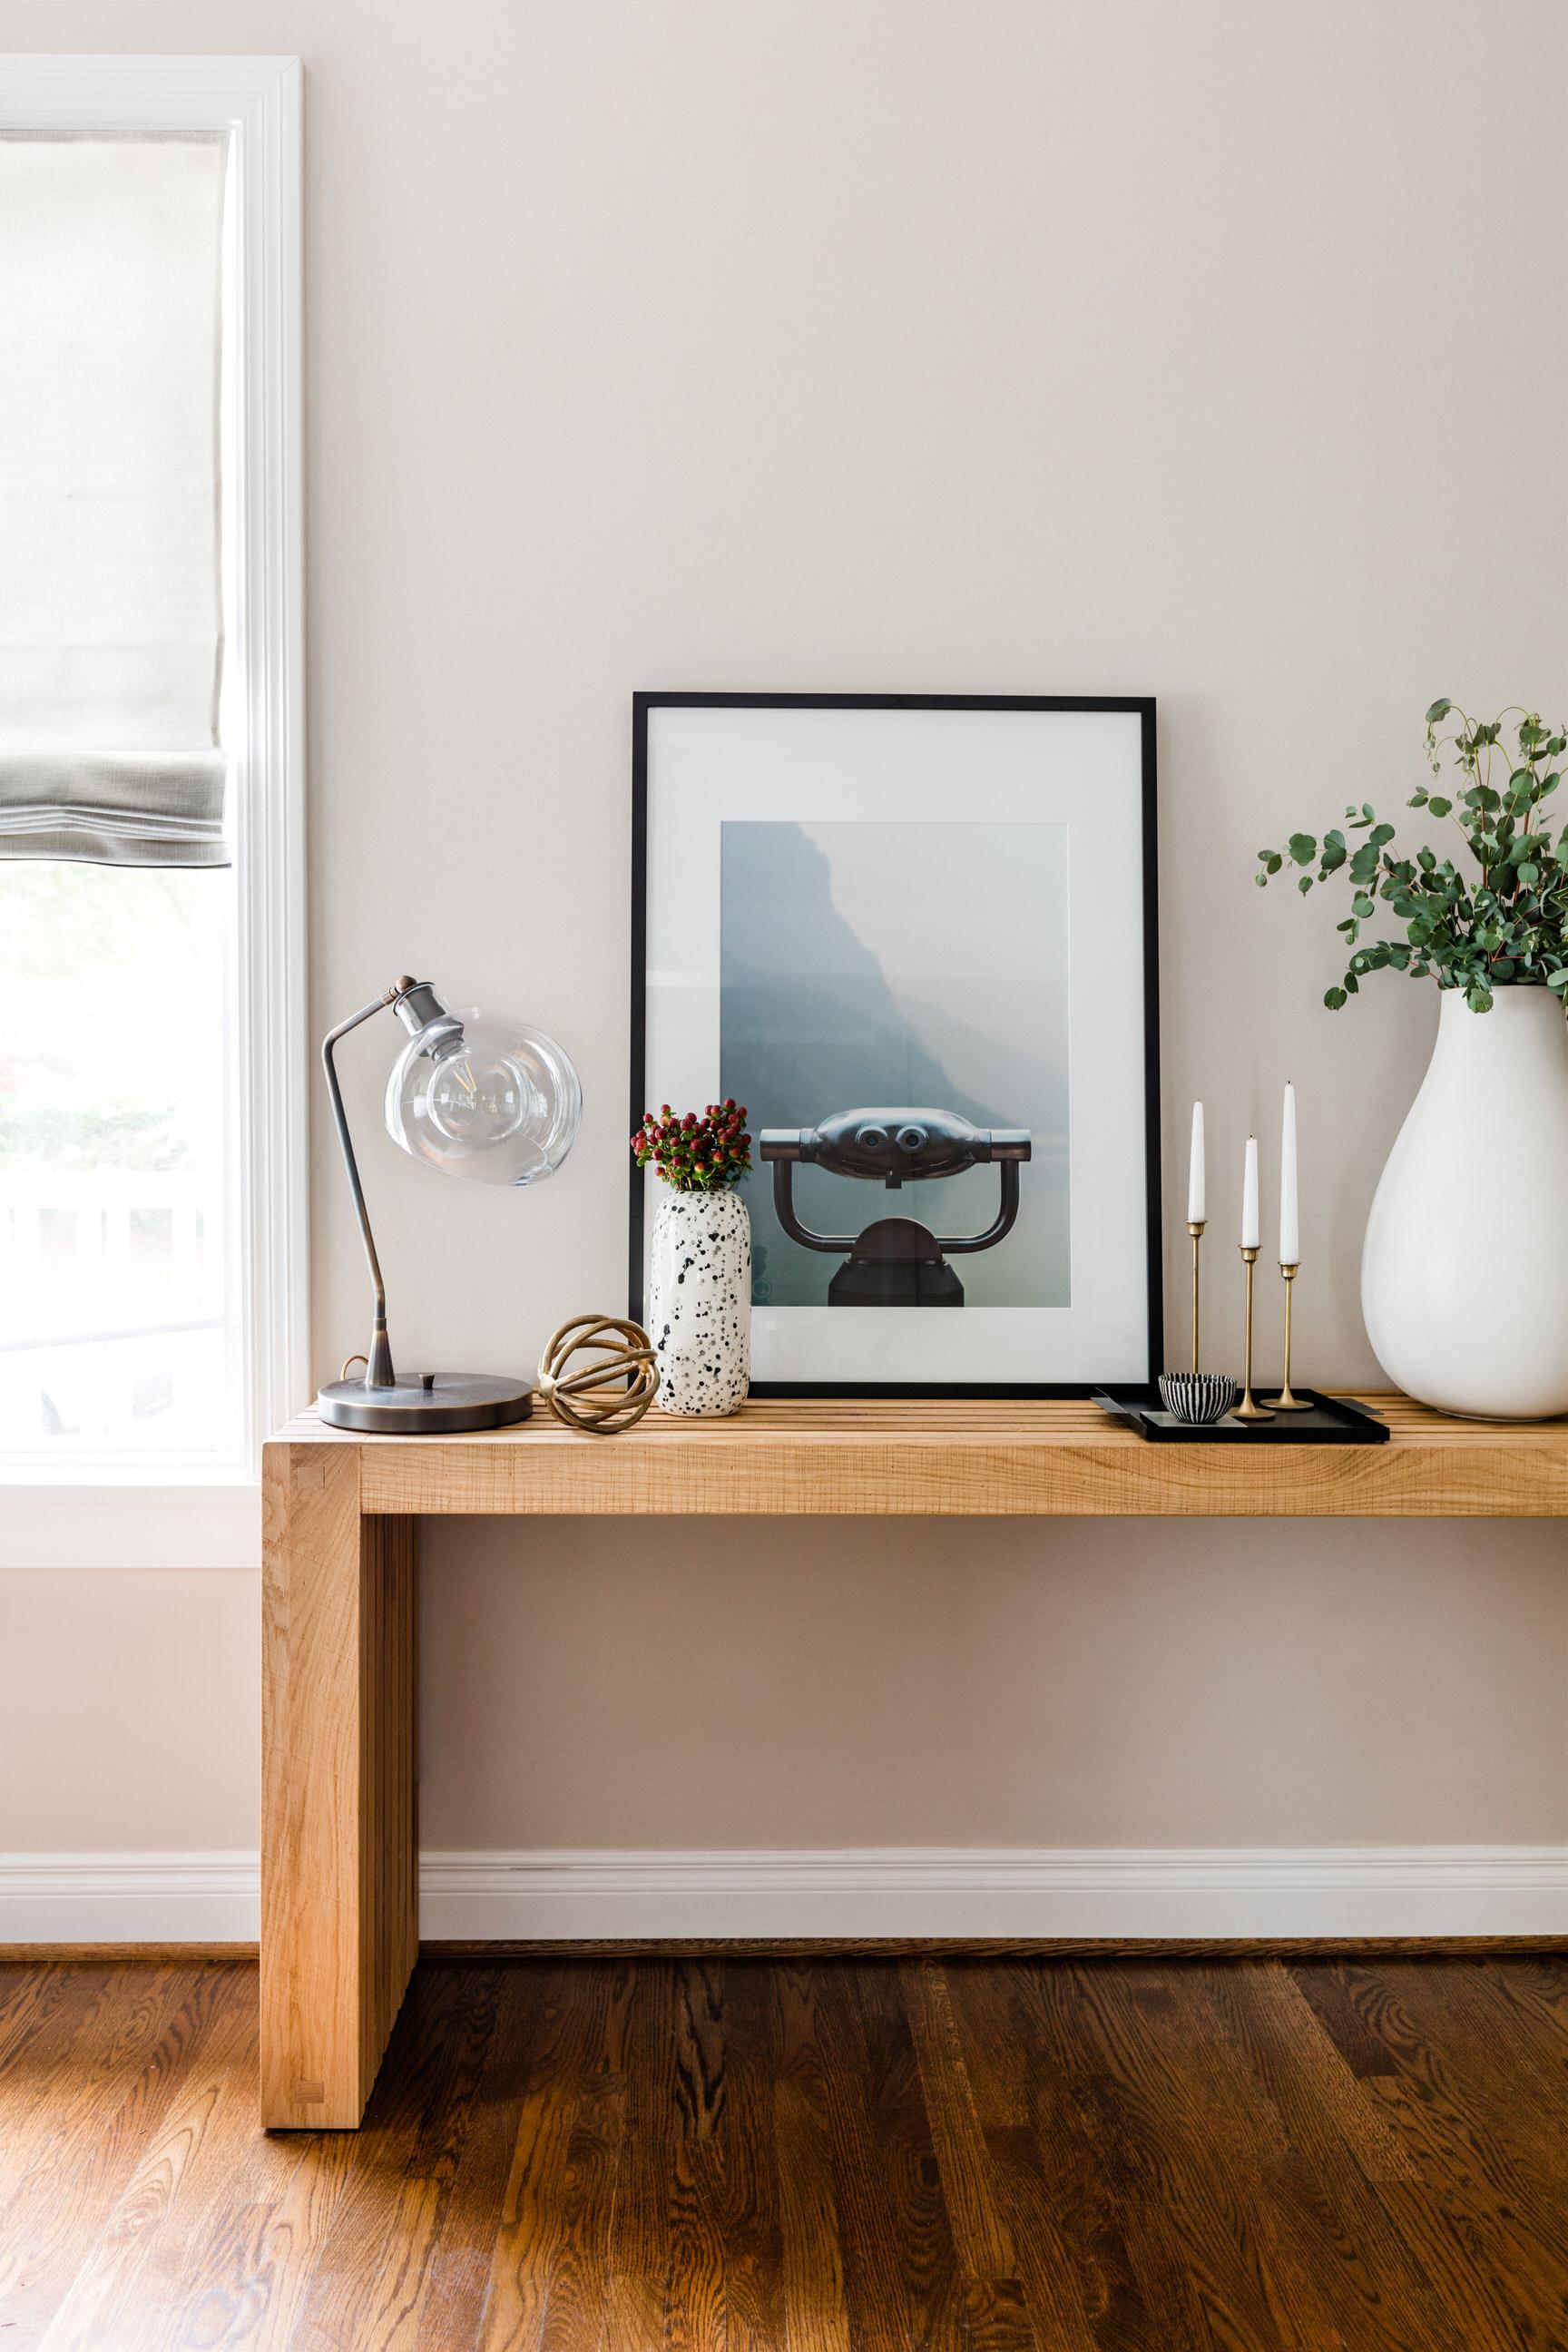 0004-Miranda-Estes-Photography-The-Residency-Bureau-Wallingford-20190515.jpg